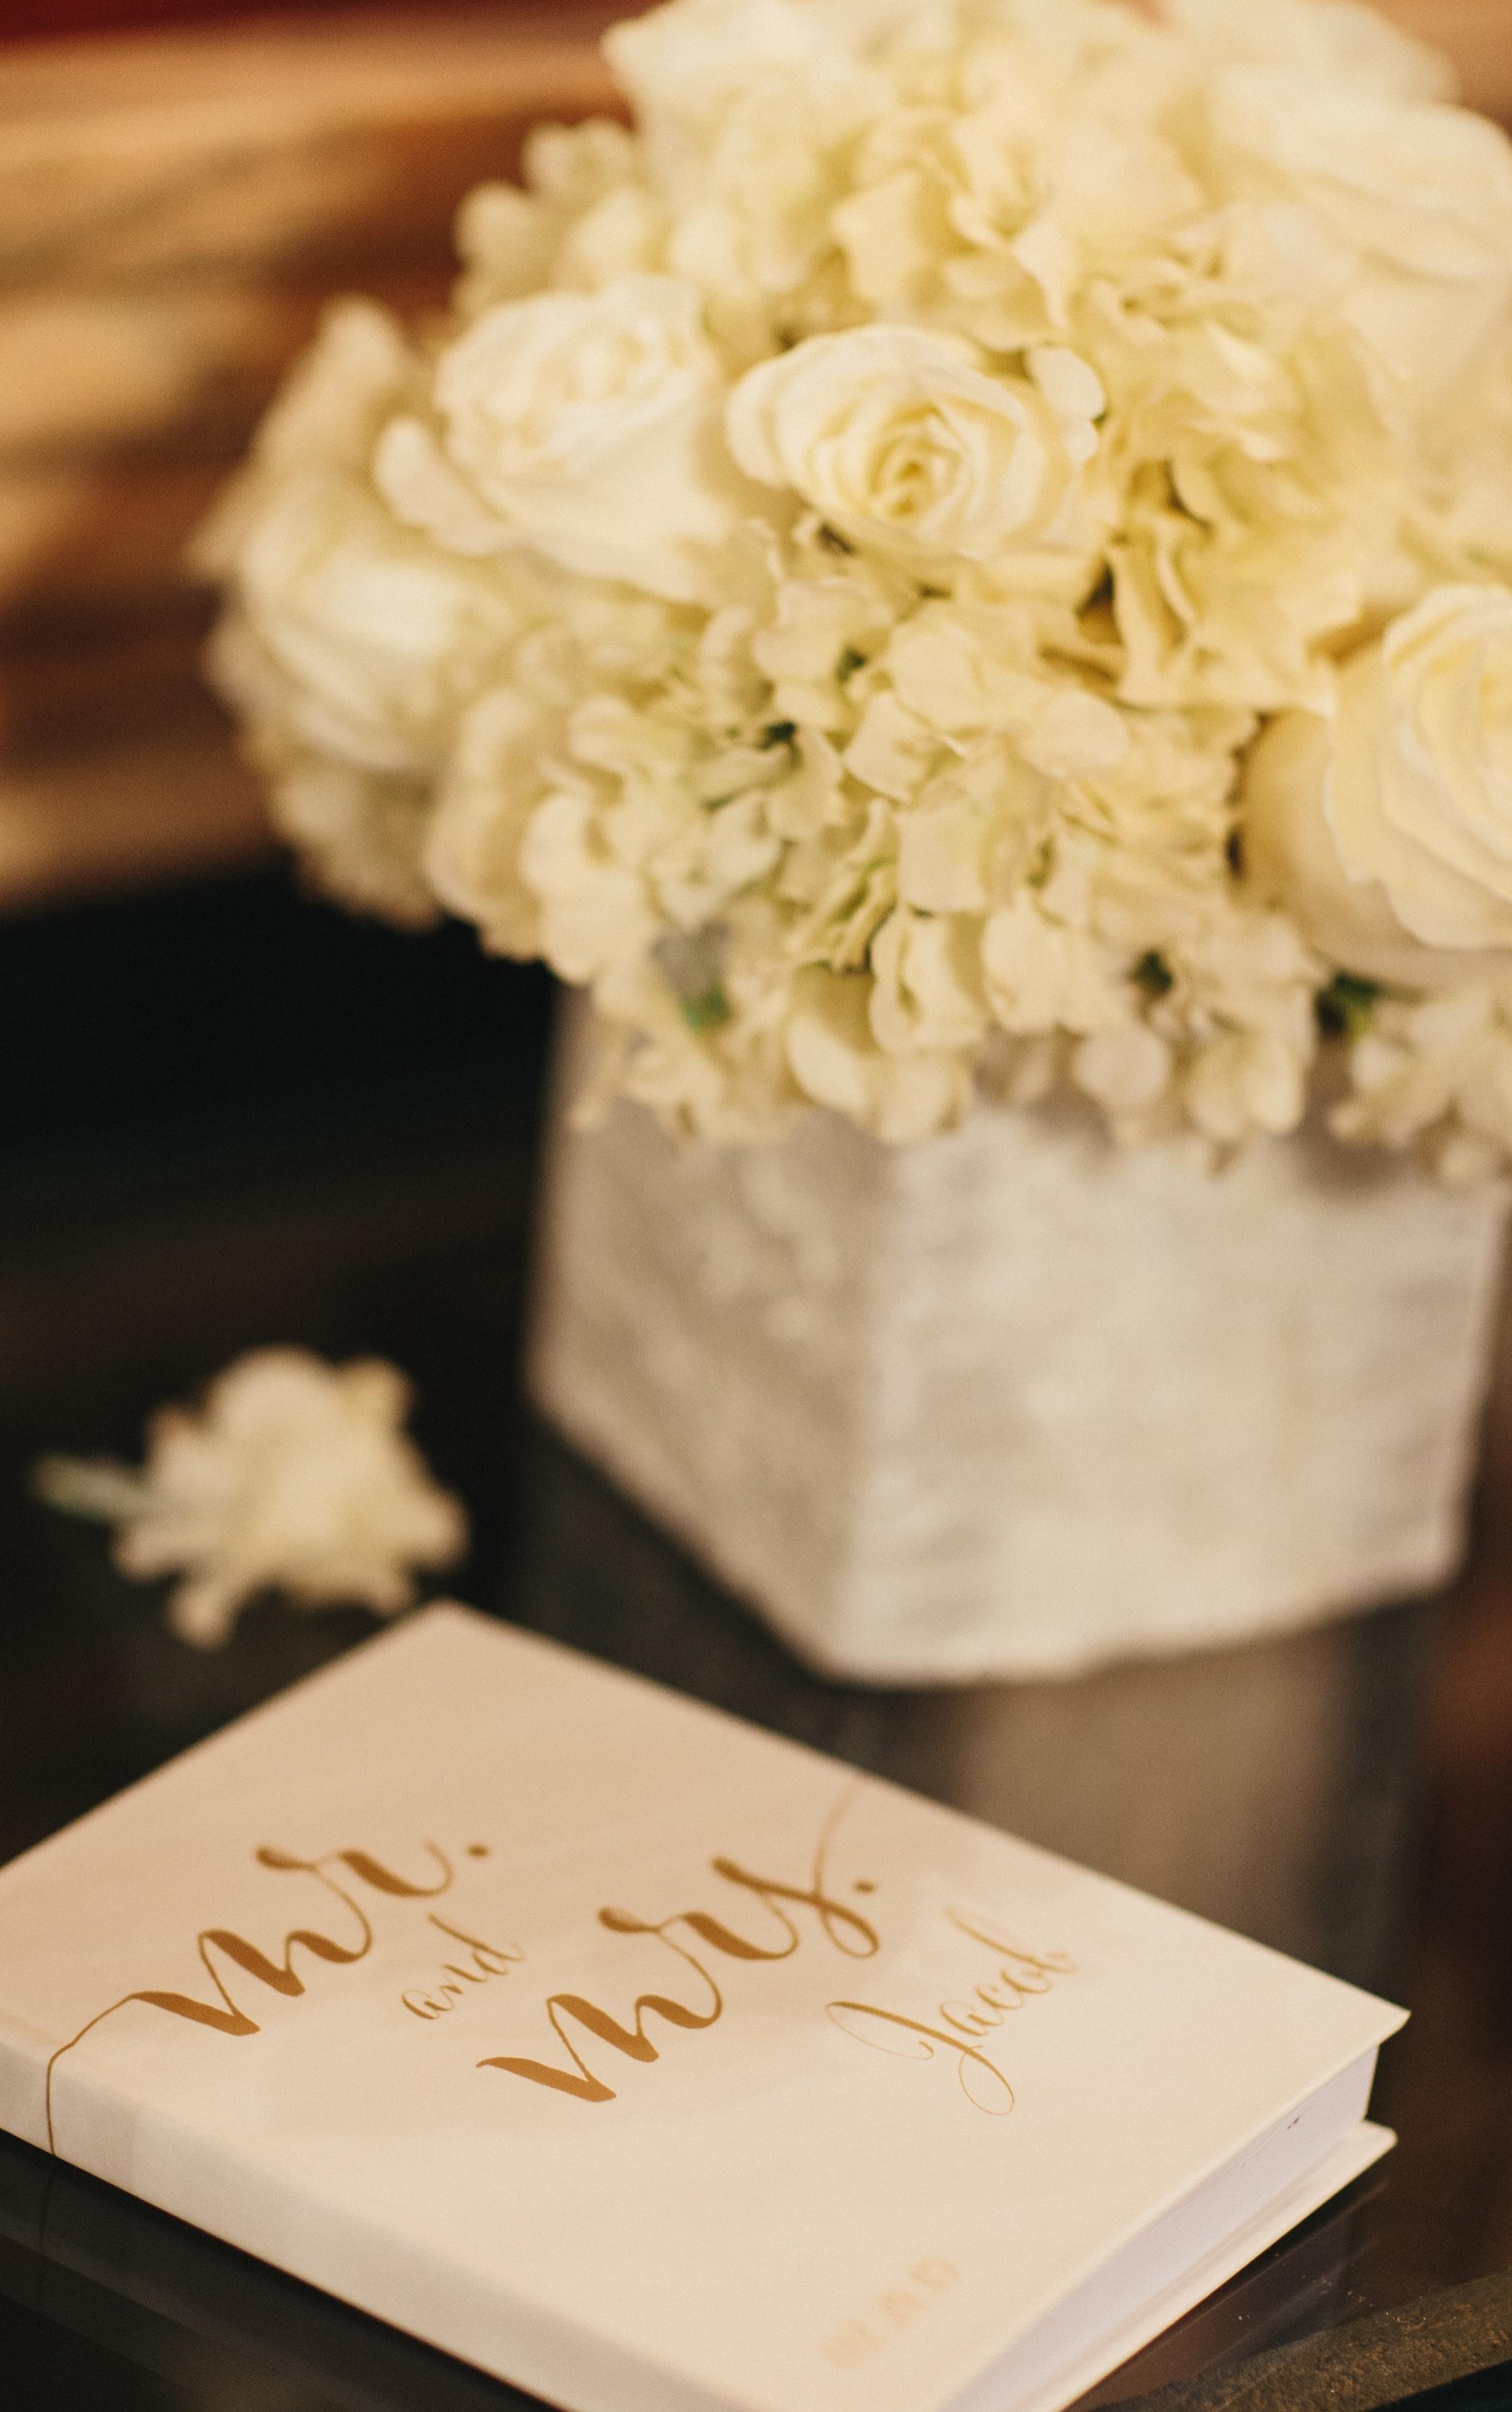 andonwill_salvage_one_wedding-4311.jpg